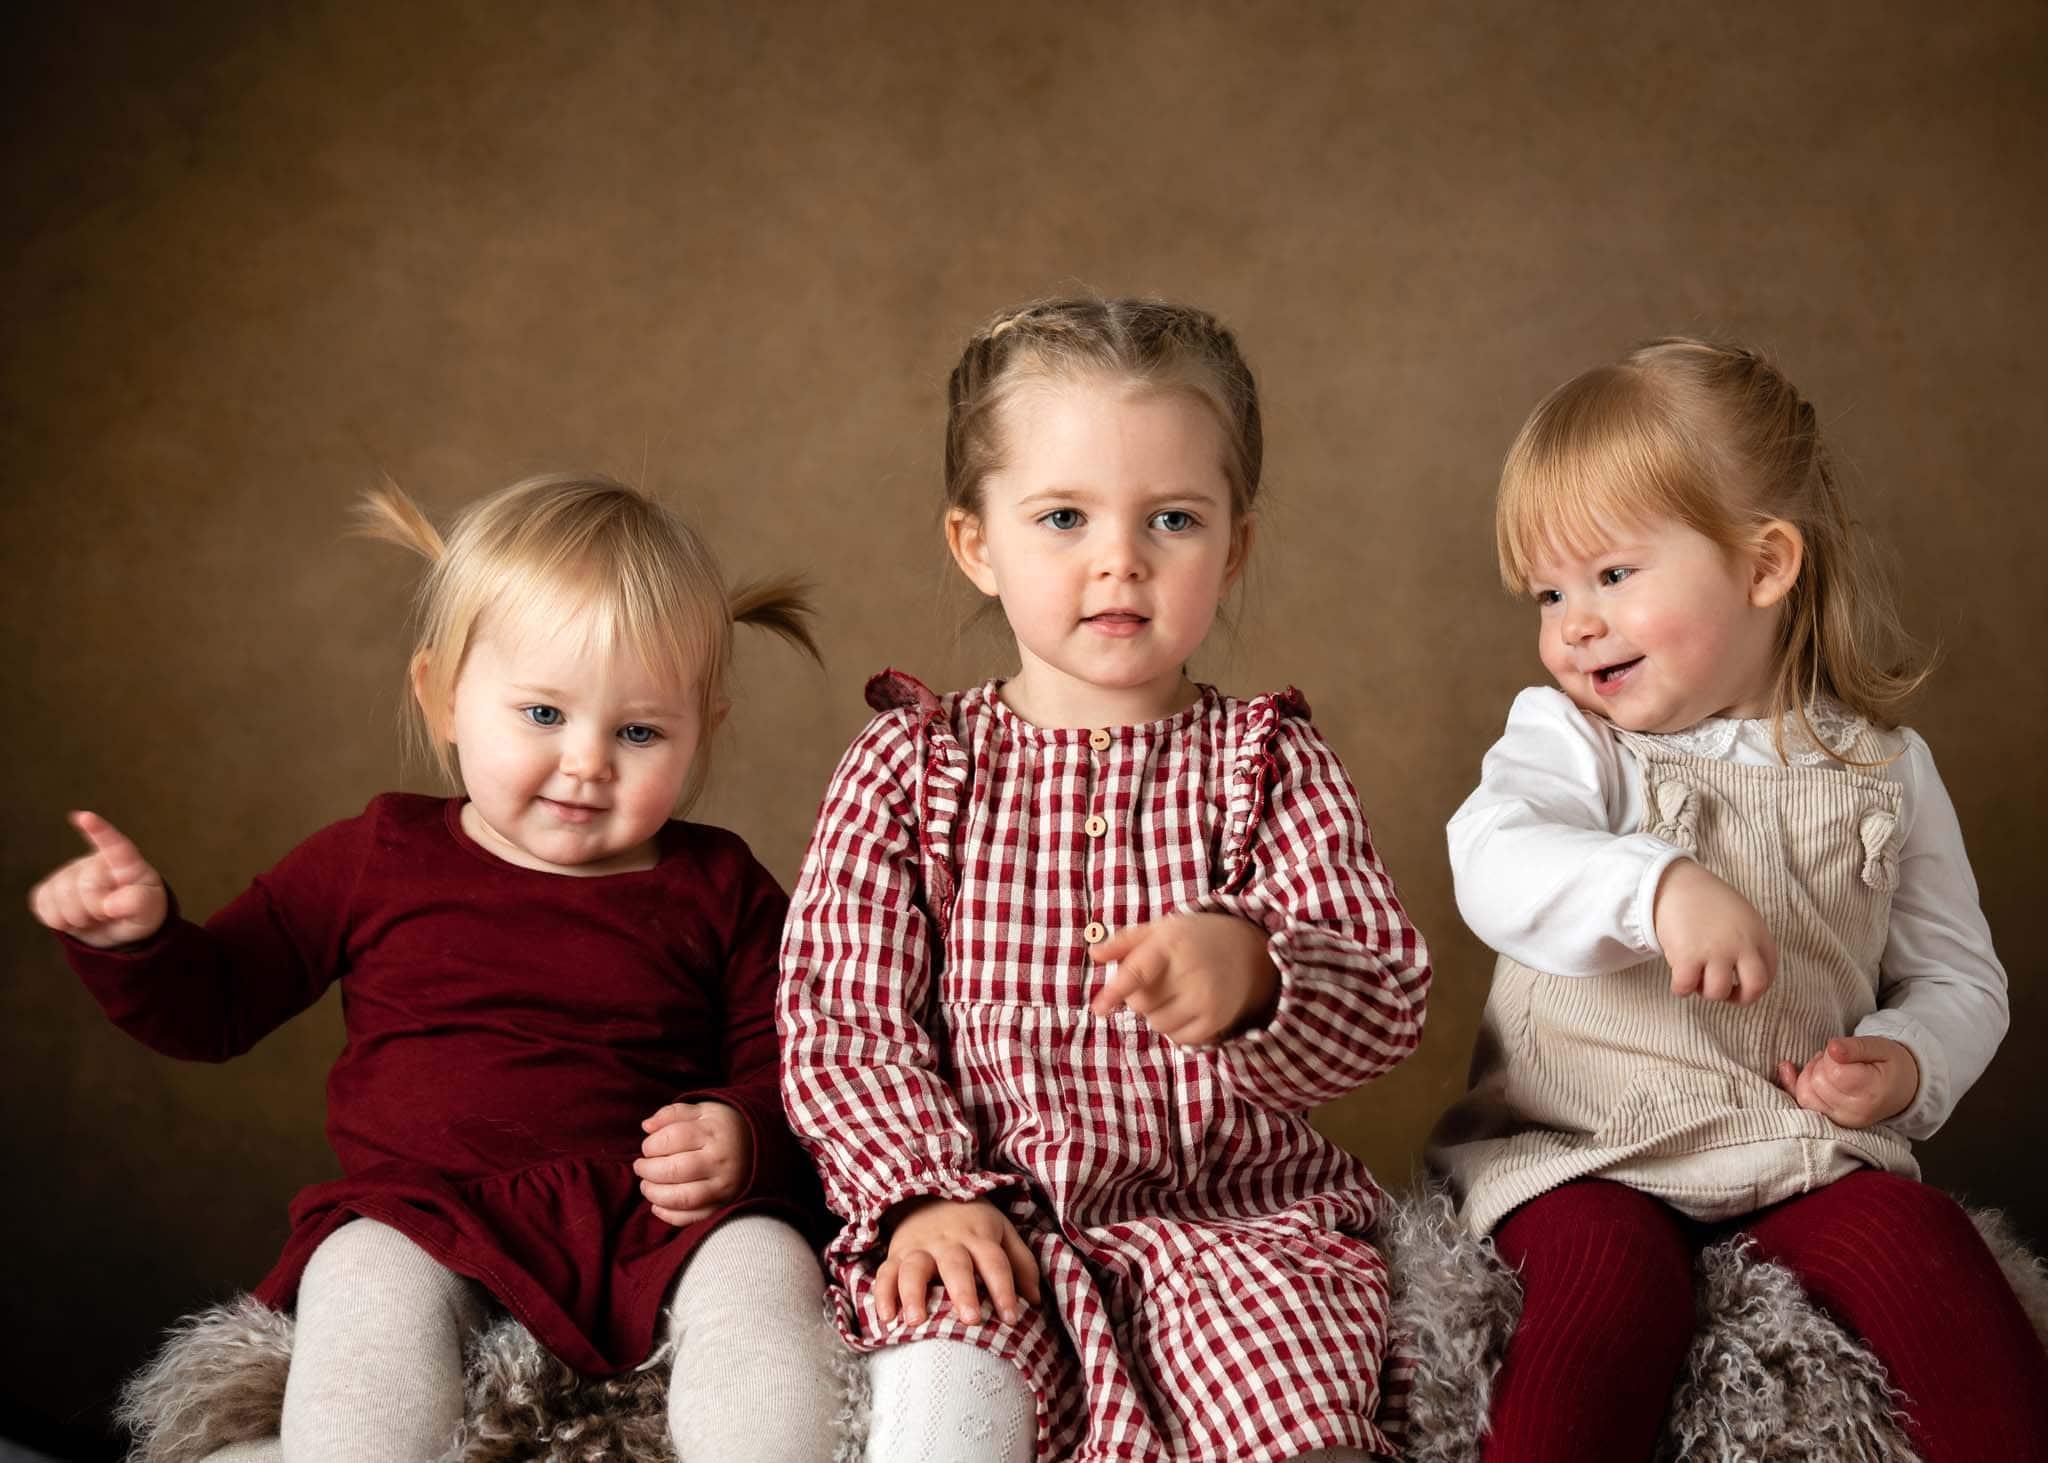 Julfoto i studio - kusiner sjunger